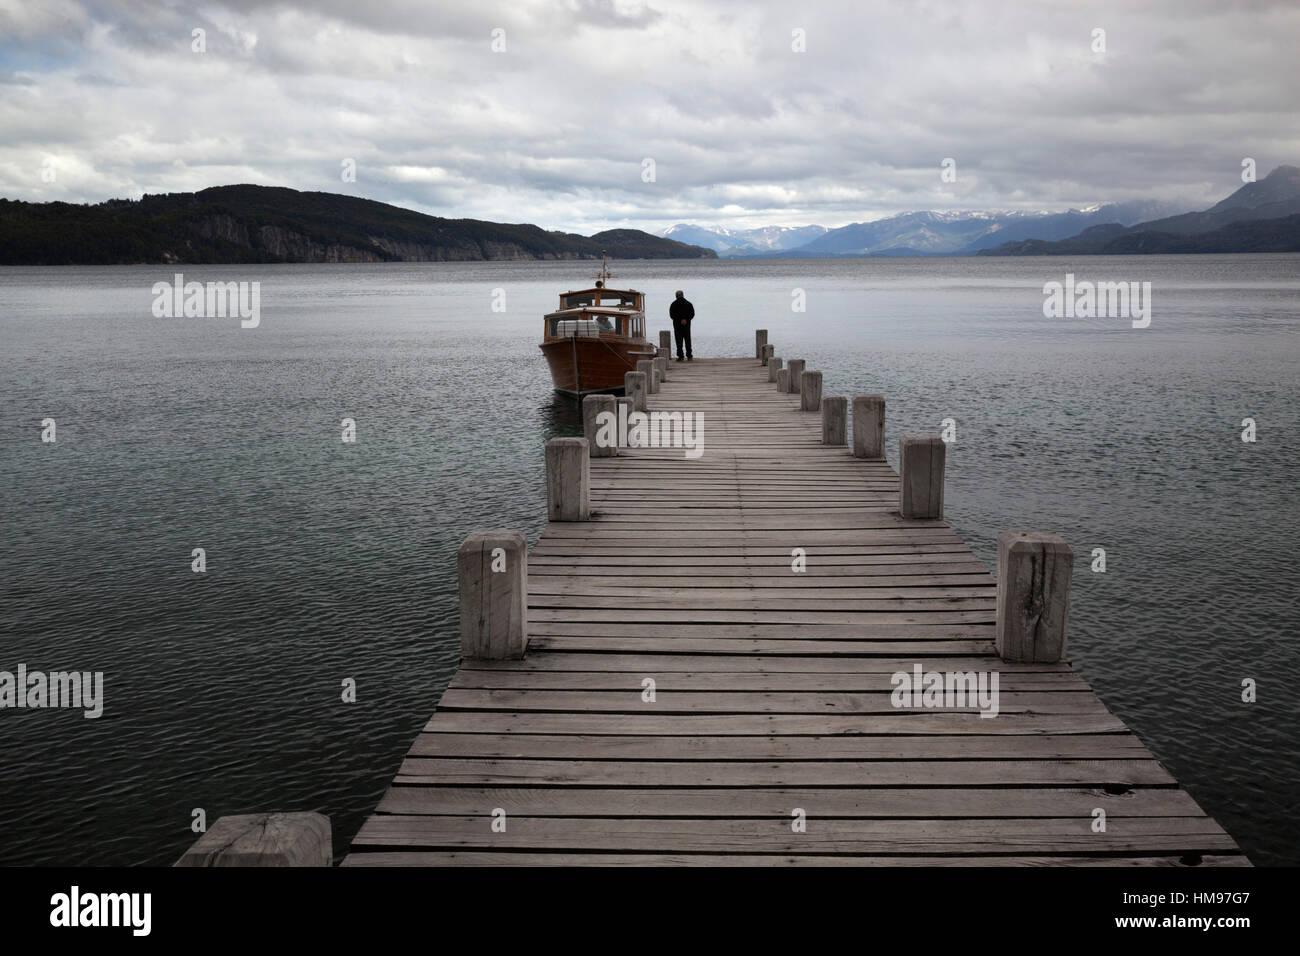 Pier on Lake Nahuel Huapi, Villa La Angostura, Nahuel Huapi National Park, The Lake District, Argentina, South America - Stock Image